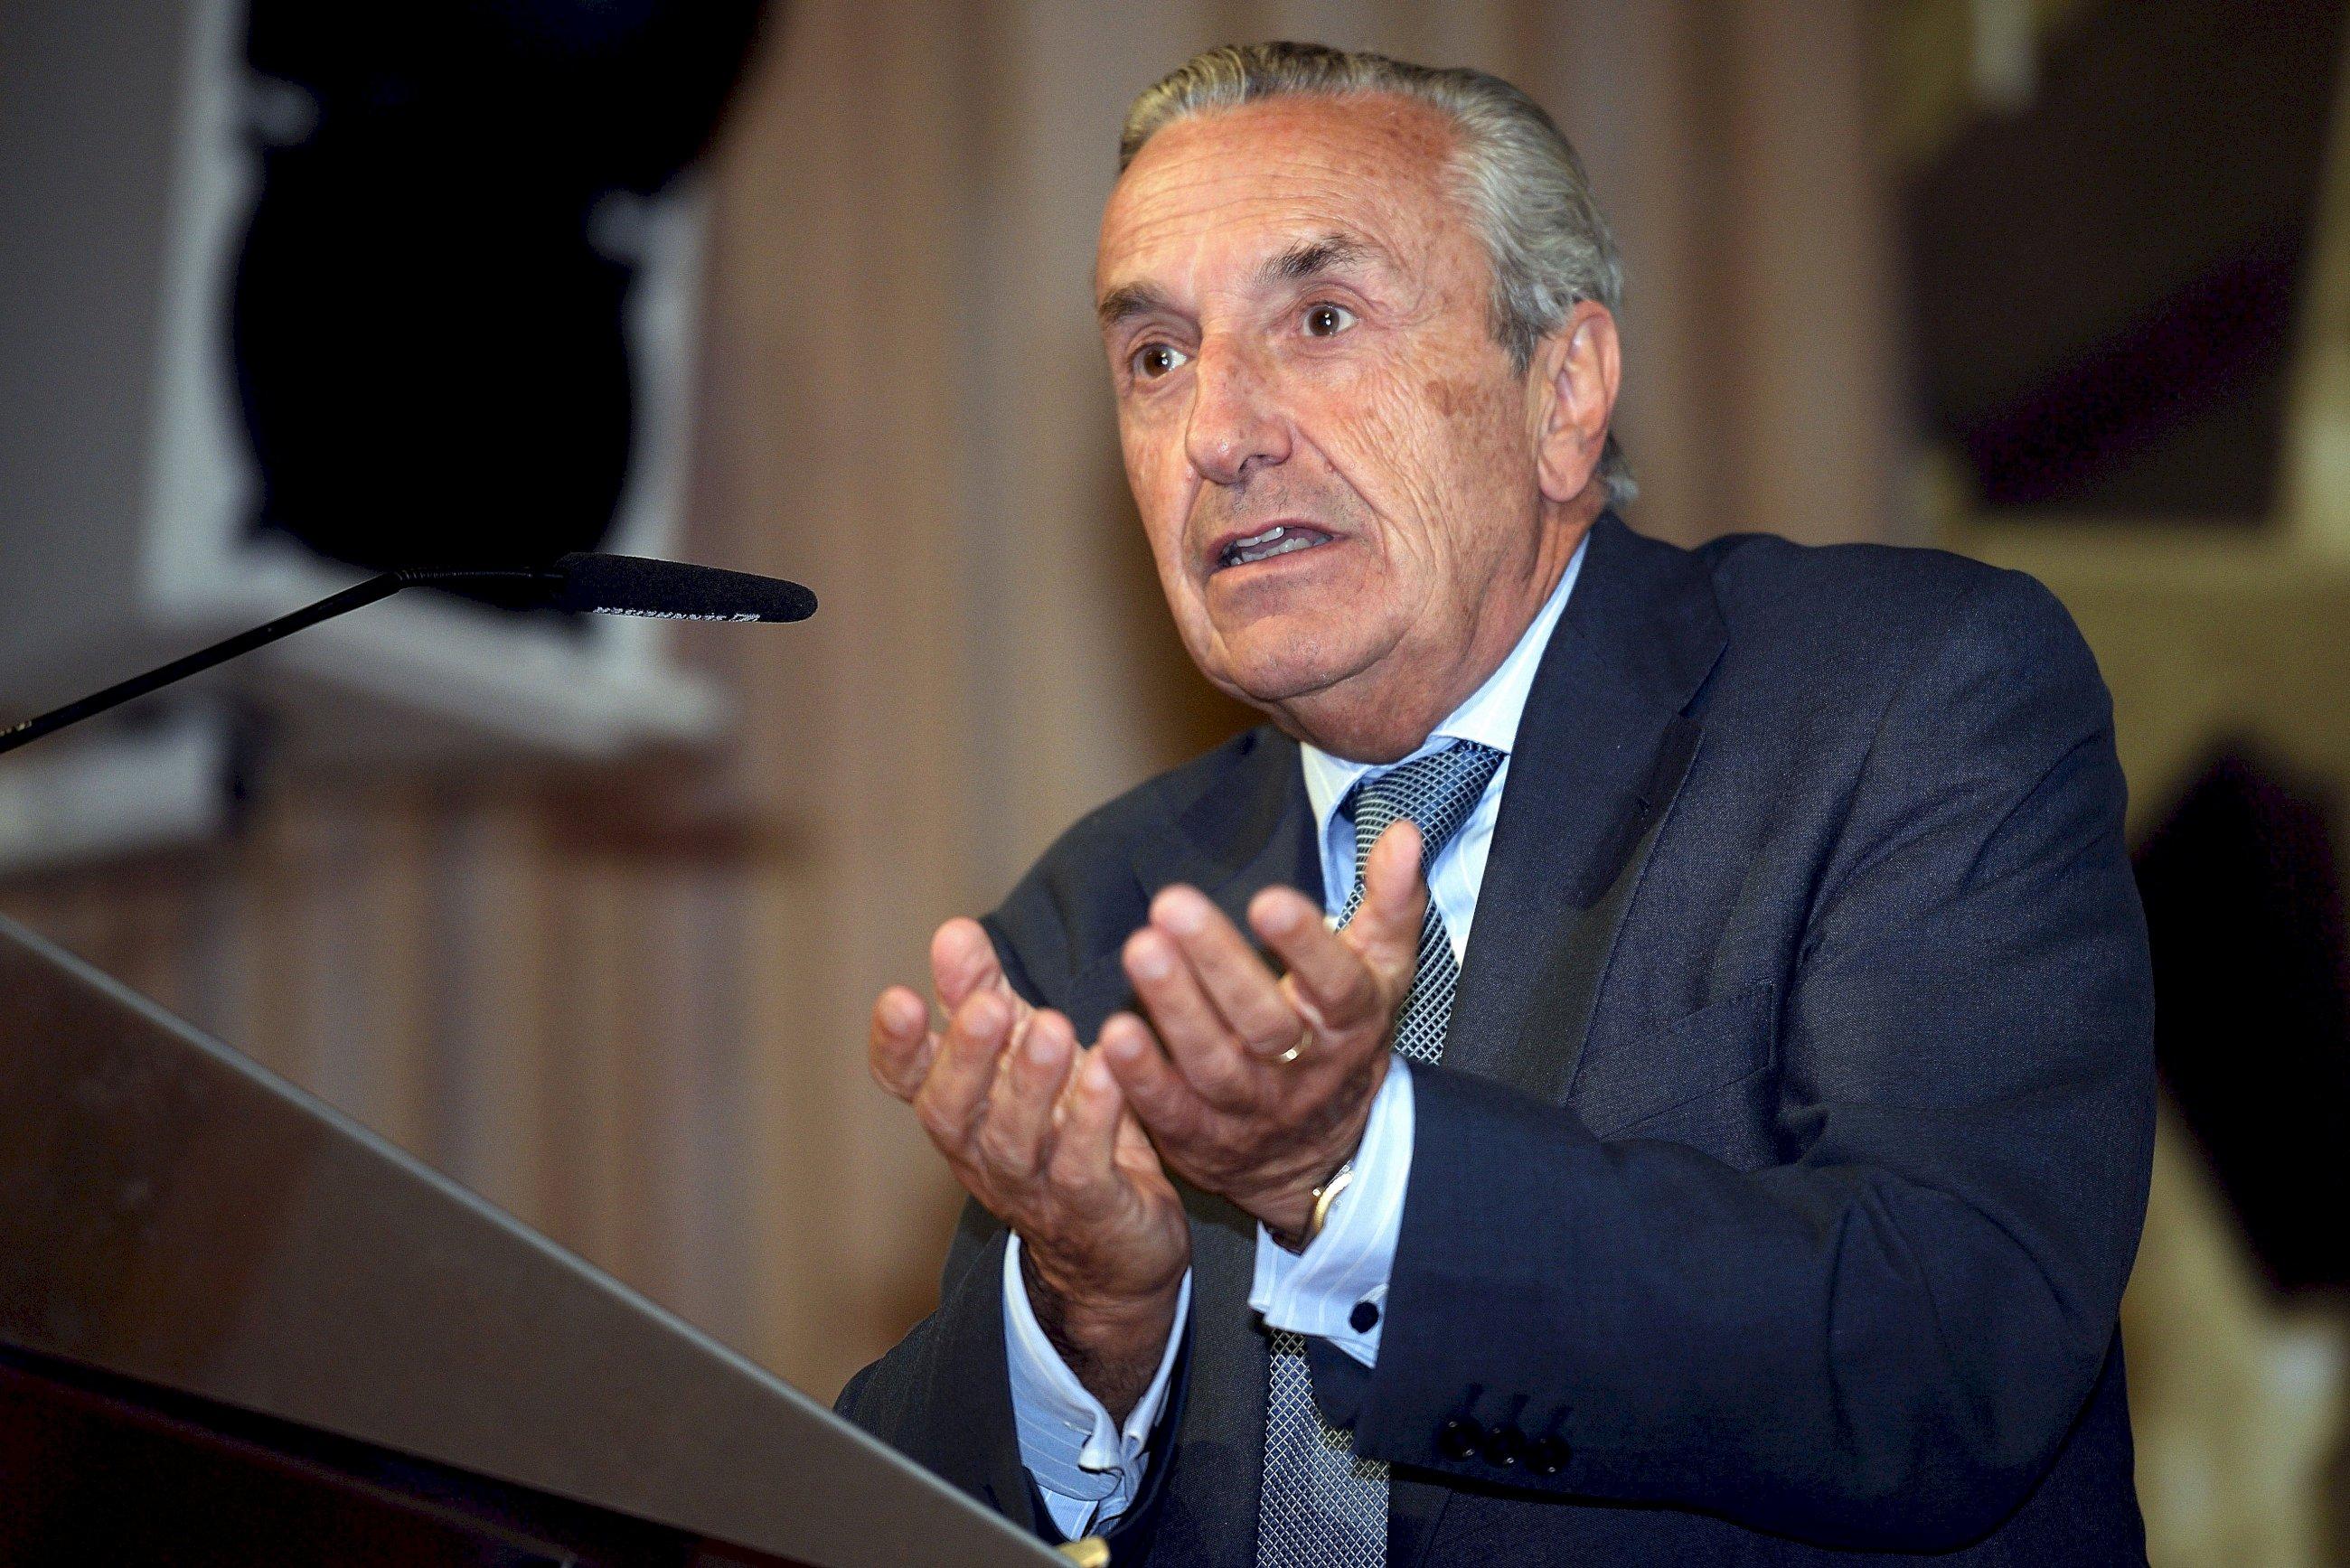 Competencia investiga a una firma gallega en un cártel de combustibles